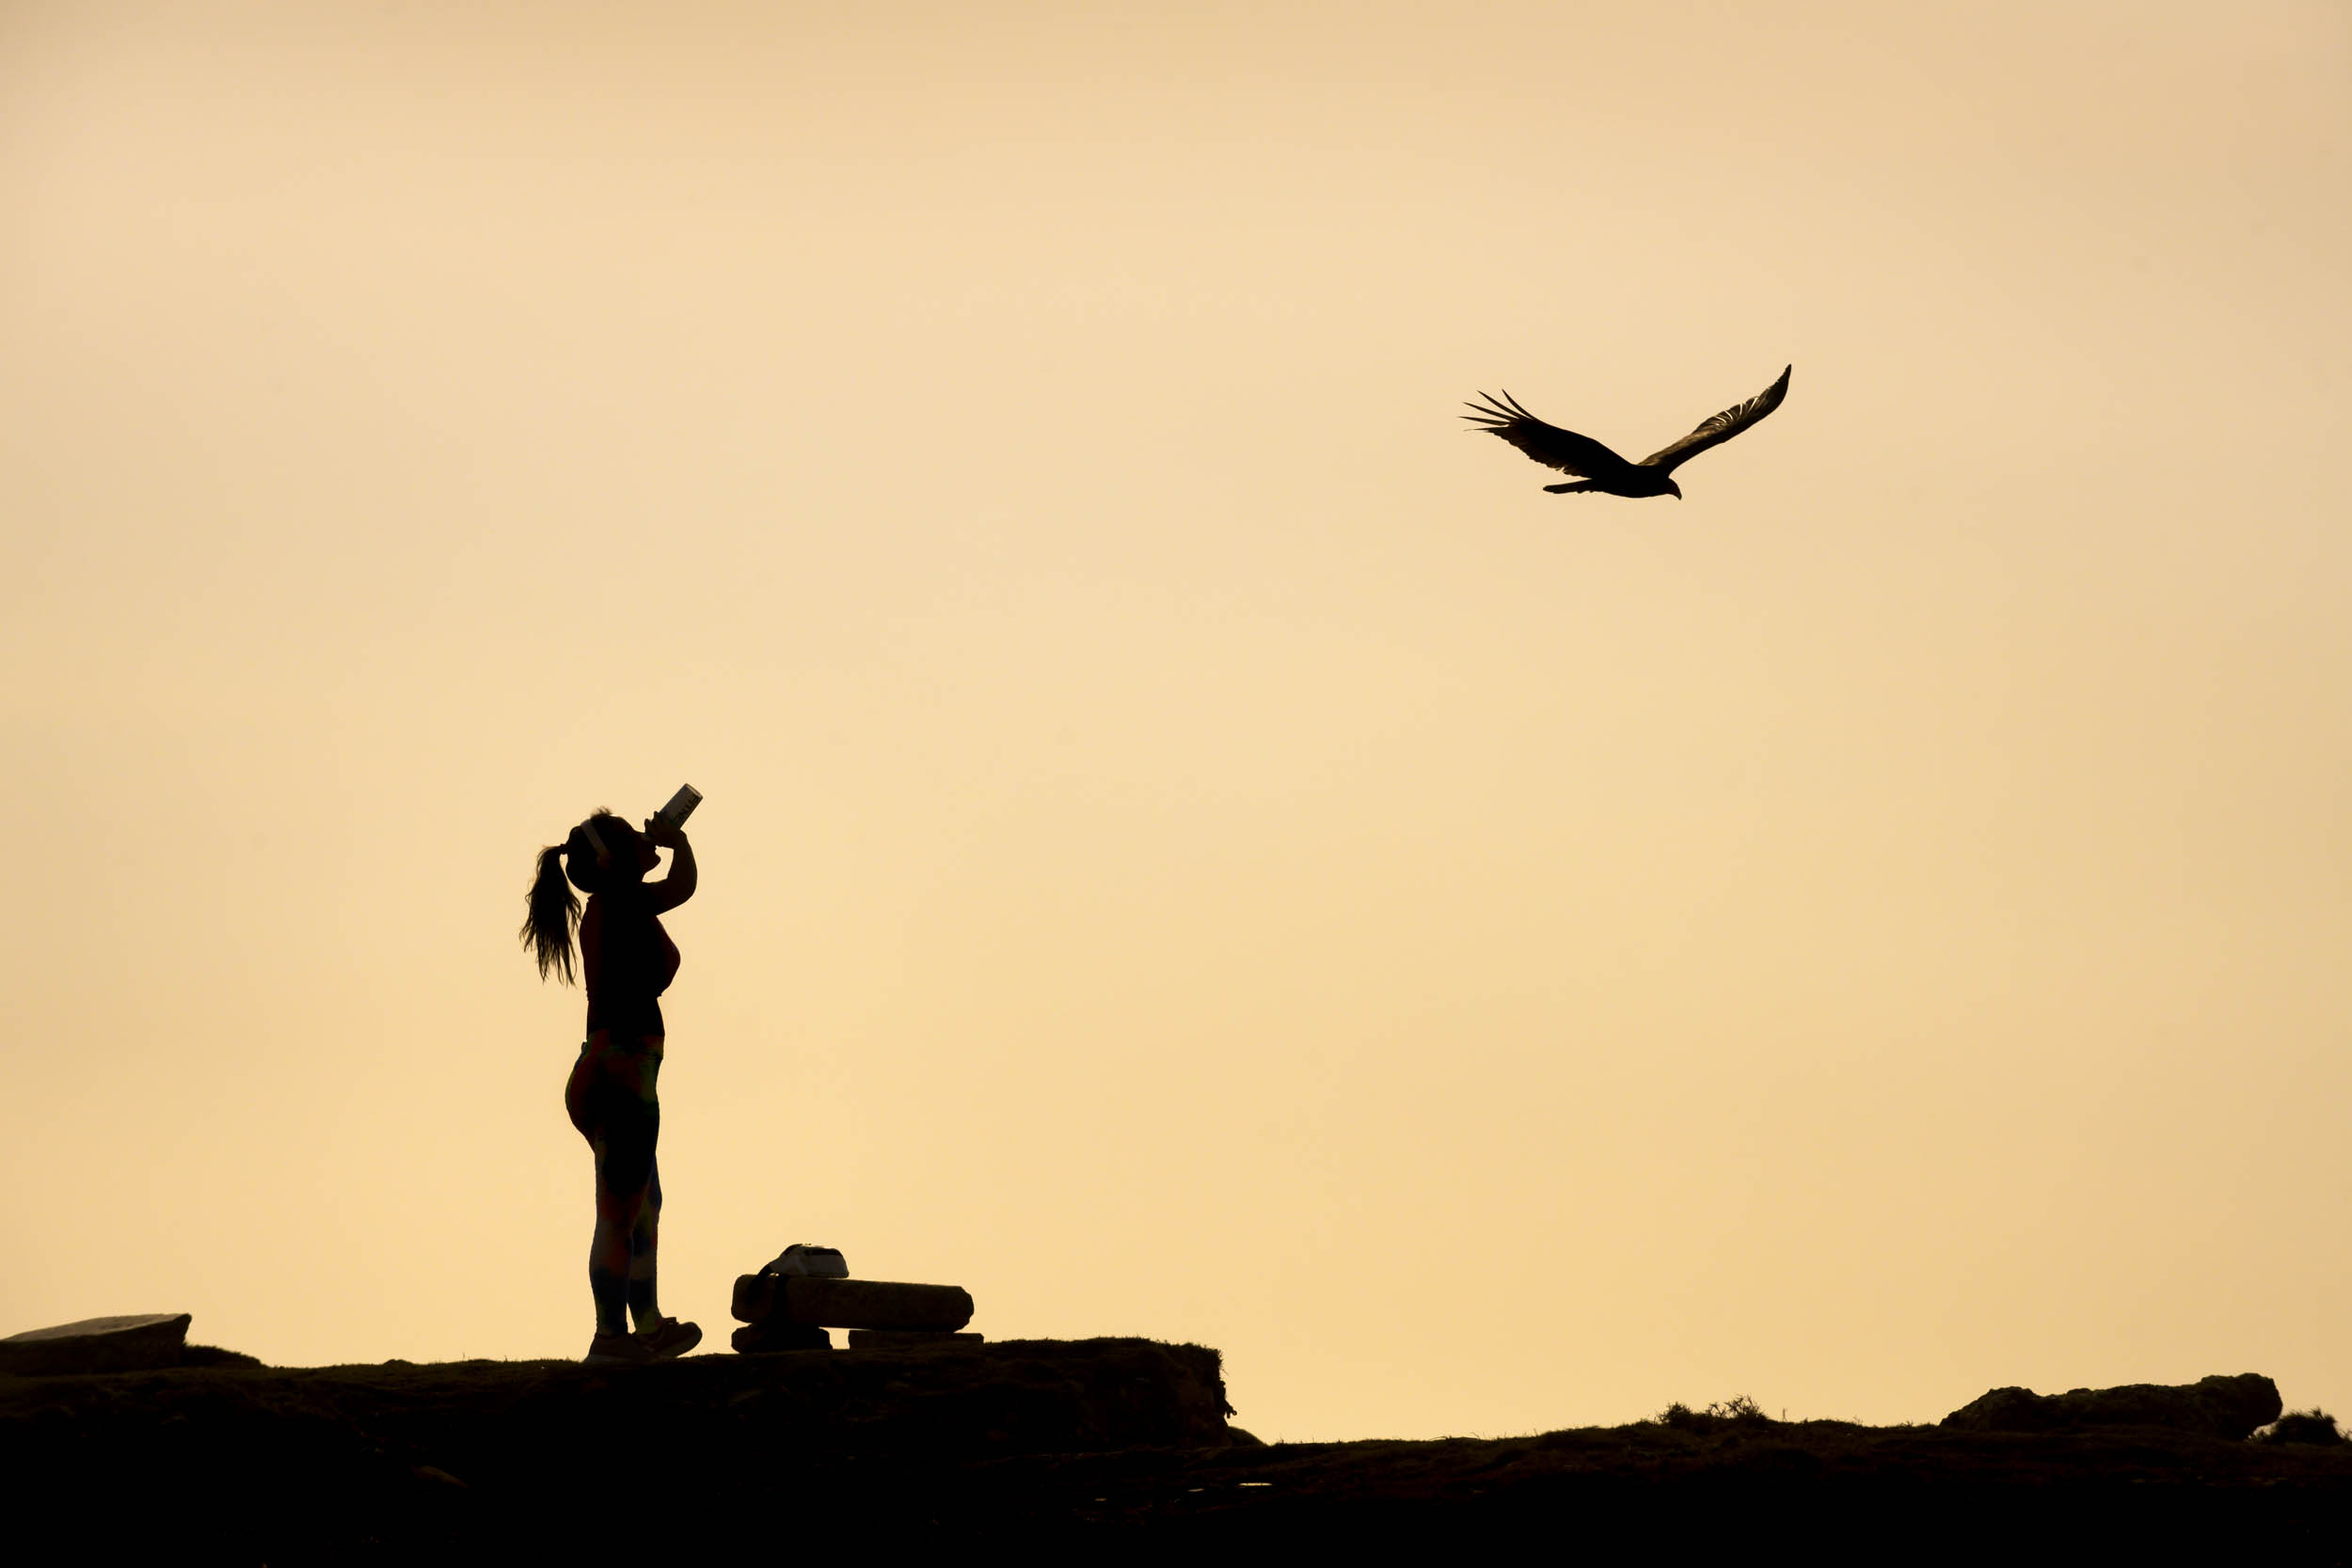 Aura 1 - Cuba - Hector Garrido, Aerial and human photography